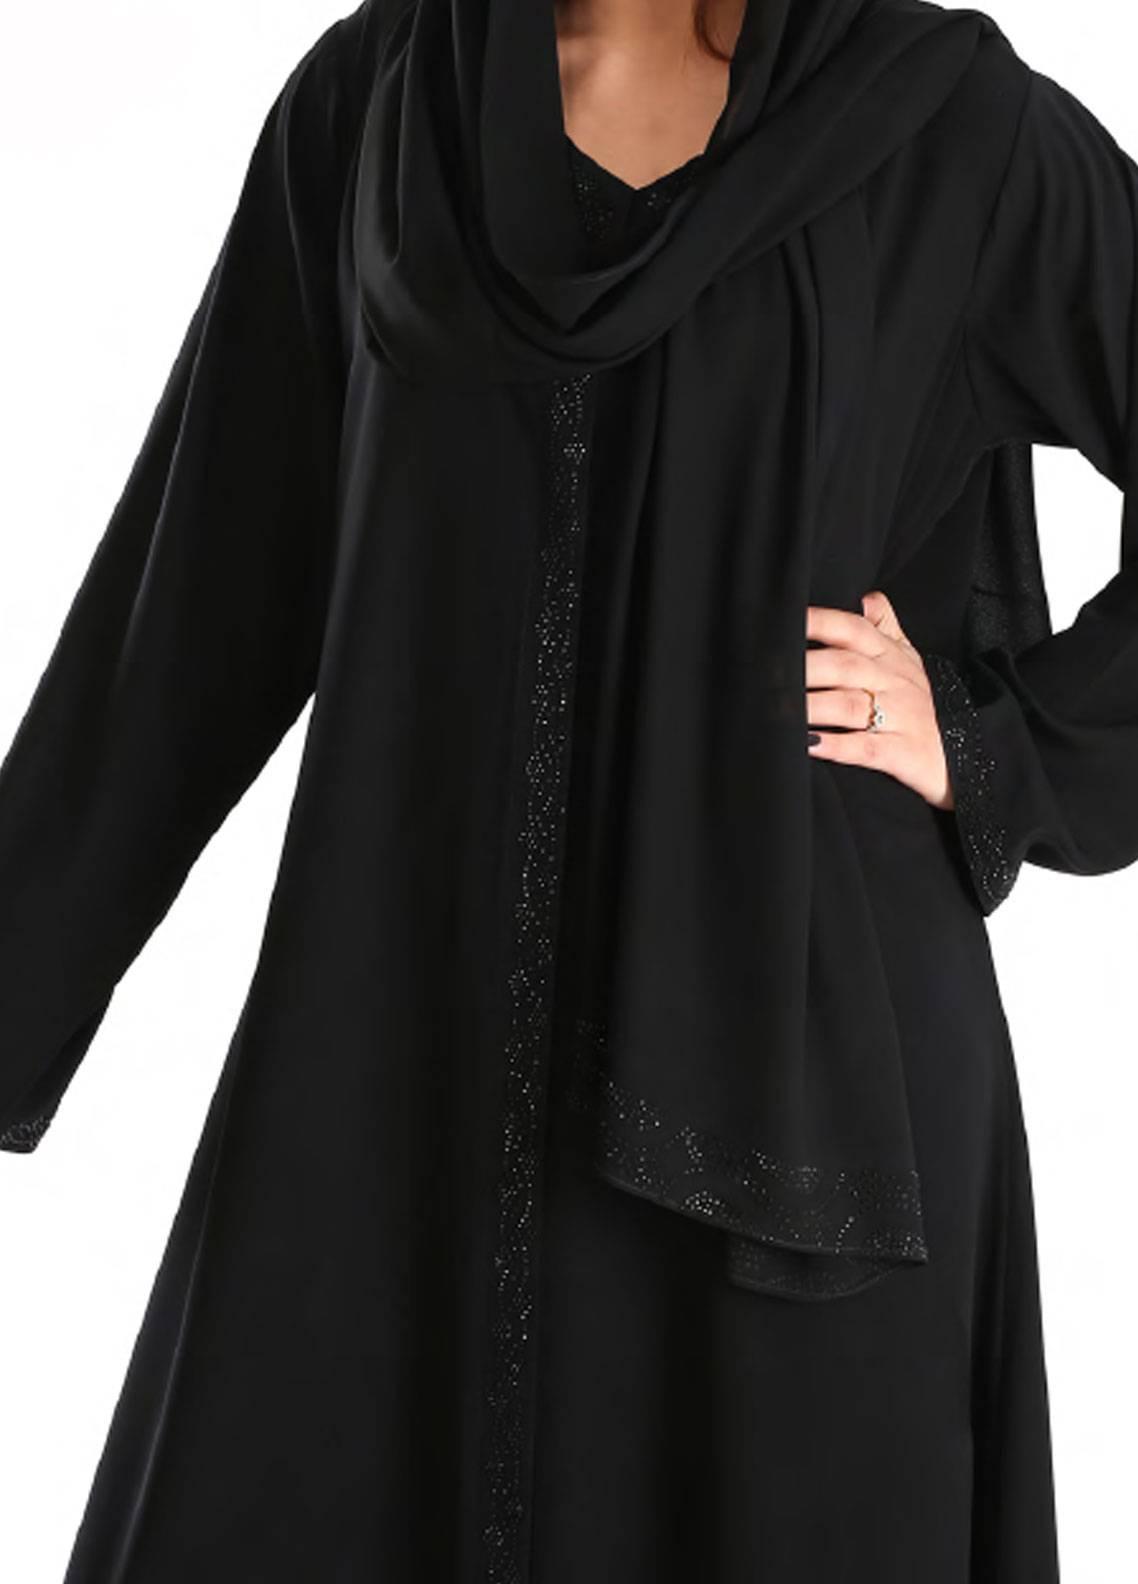 Hijab ul Hareem Formal  Stitched Abaya 0121-C-935